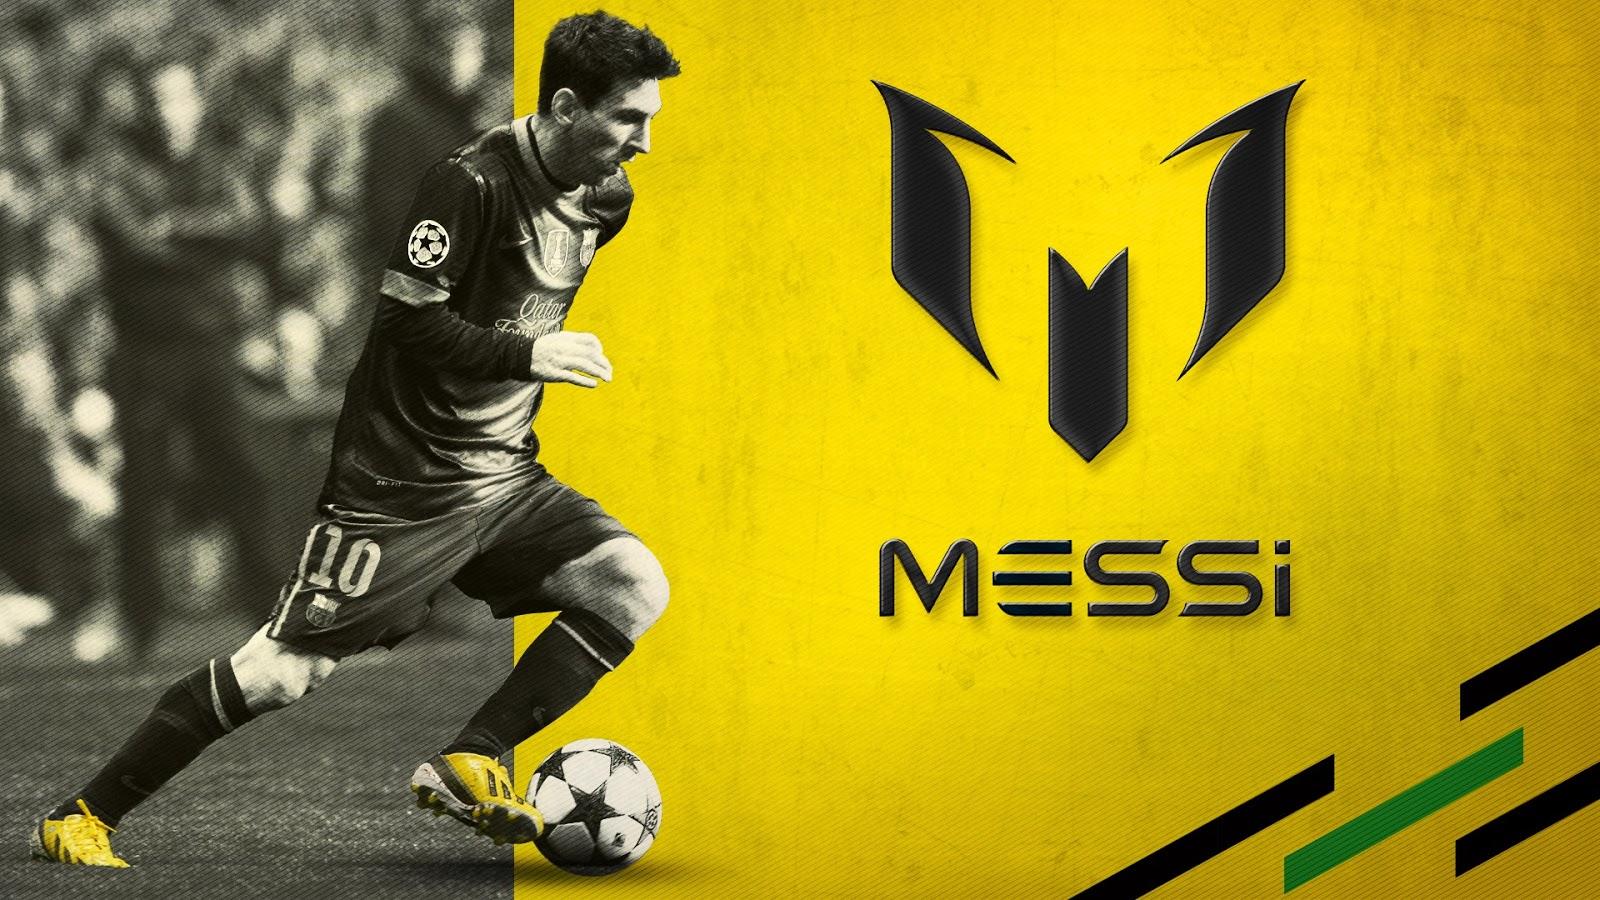 Lionel Messi WallpaperMessi Bicycle Kick Wallpaper